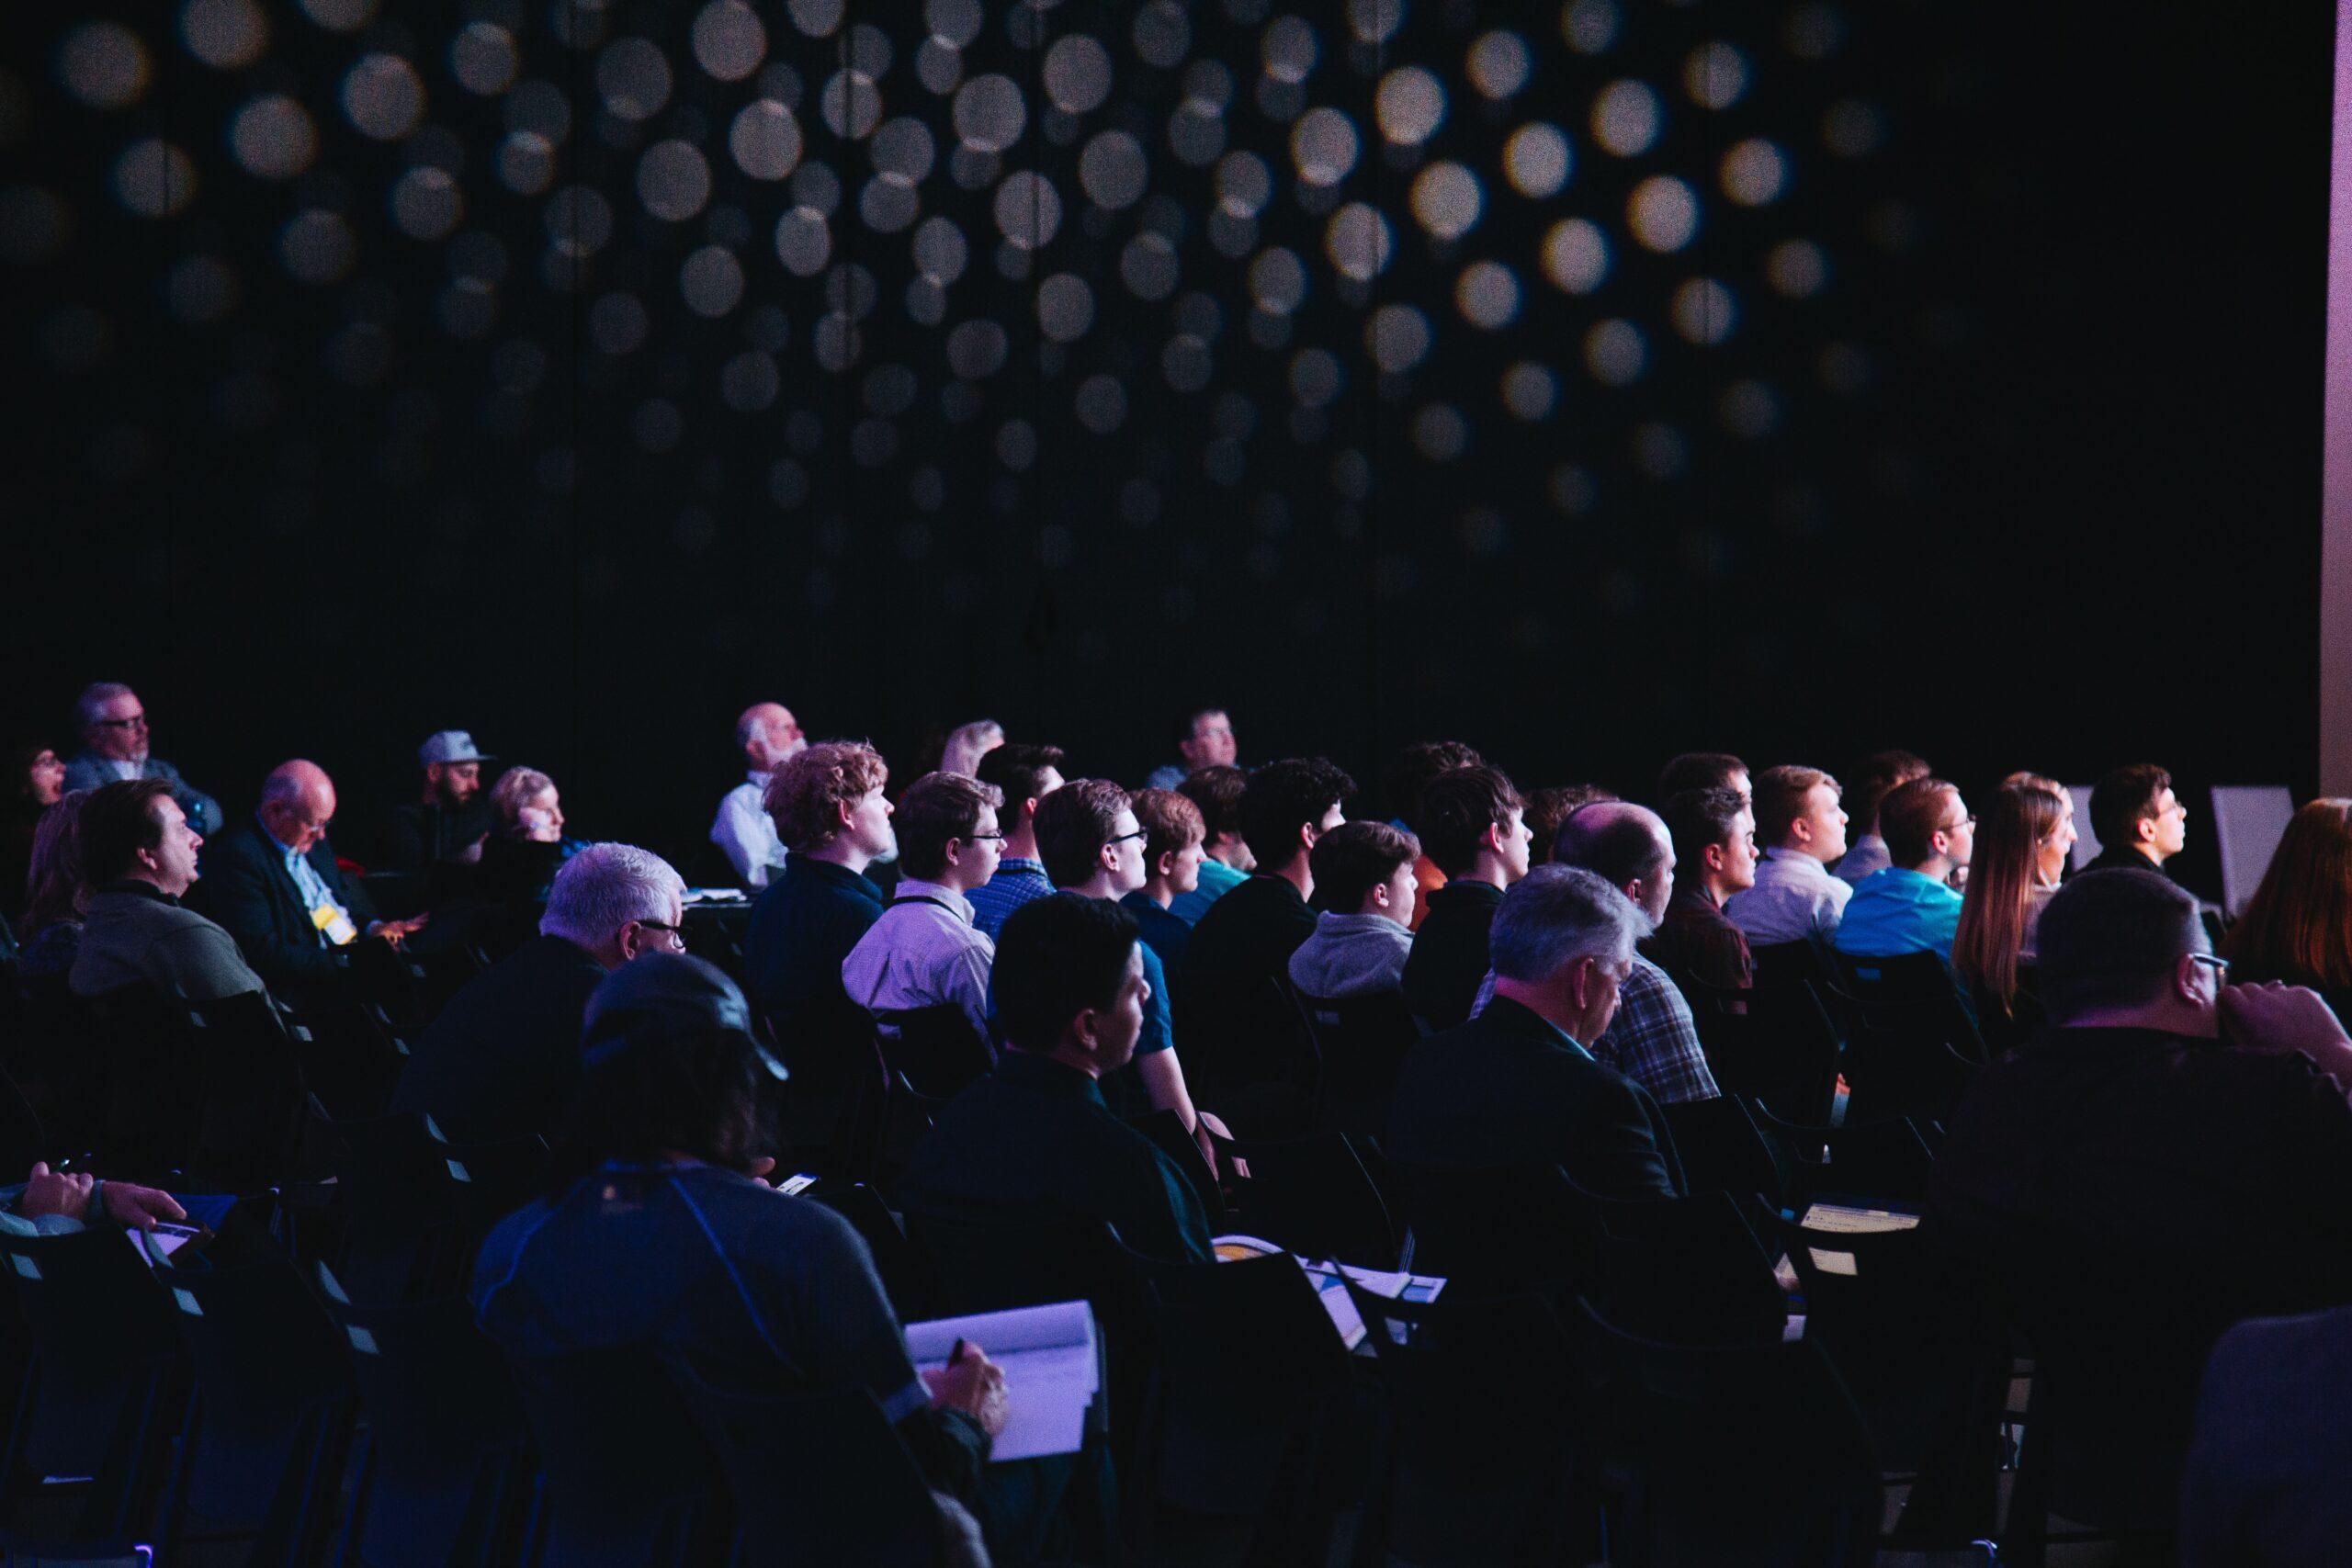 TEDx Mirandola, 3 luglio 2021